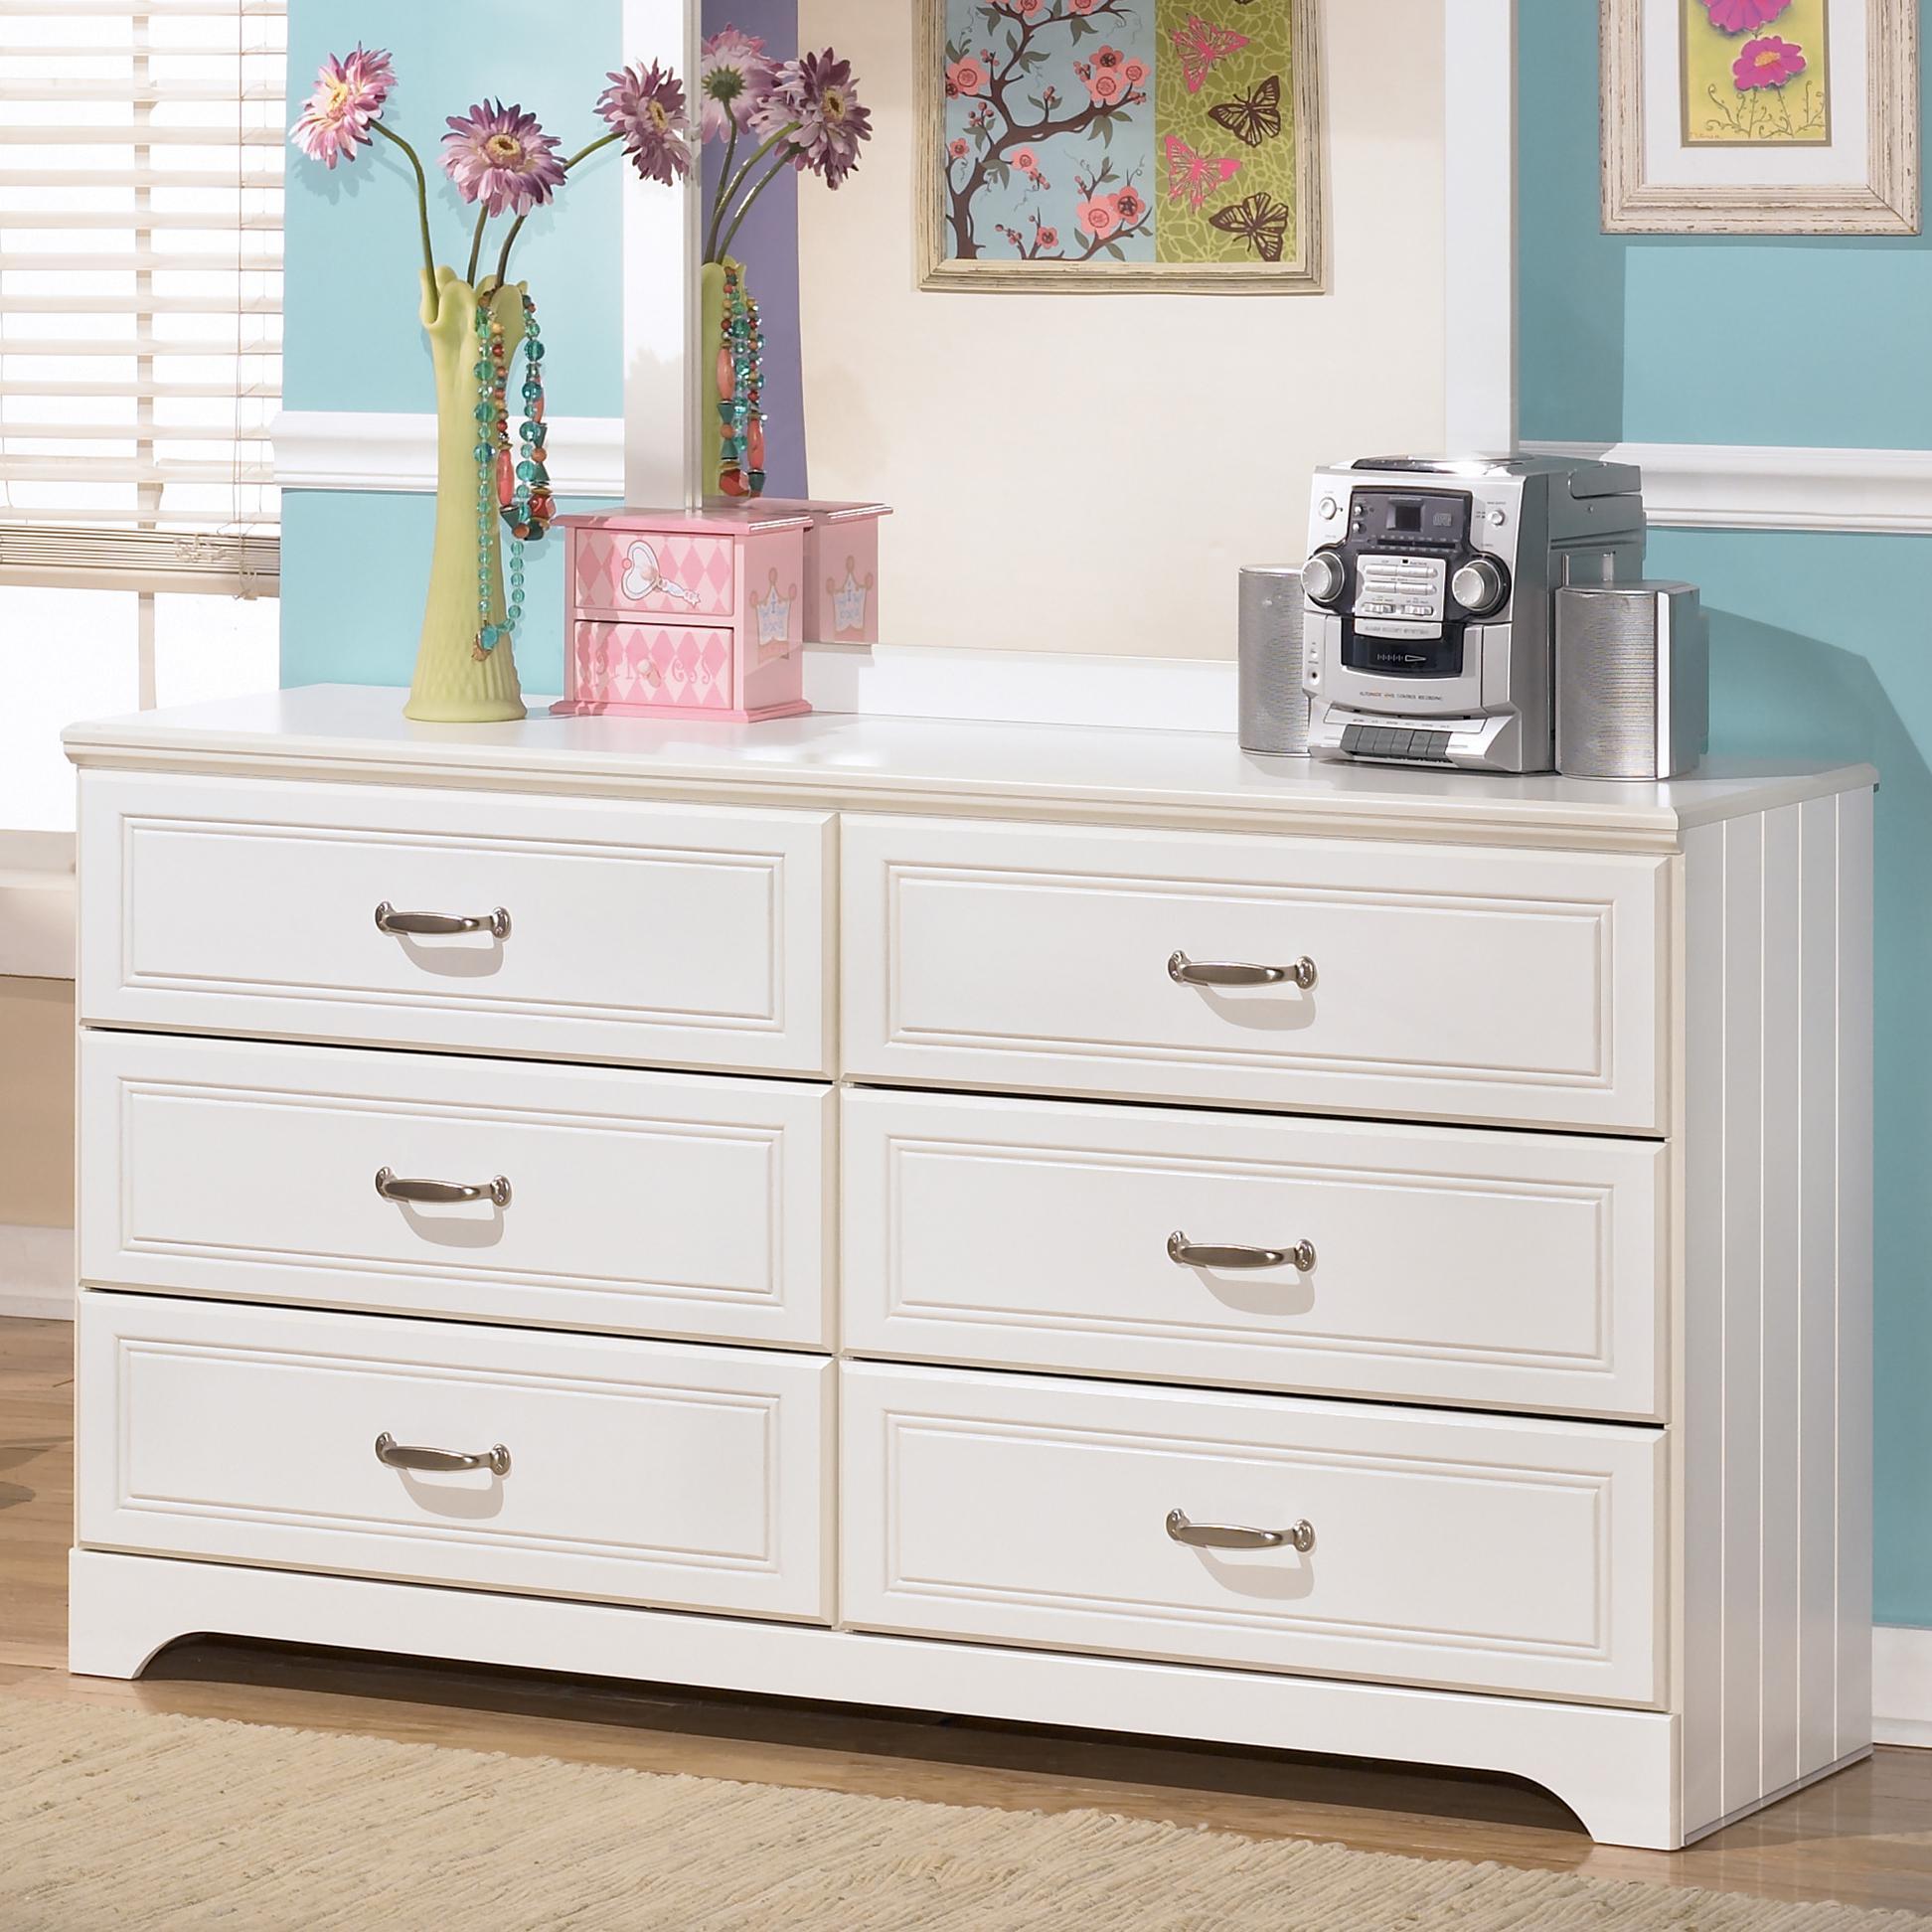 Signature Design By Ashley Lulu B102 21 6 Drawer Dresser Becker Furniture World Dressers